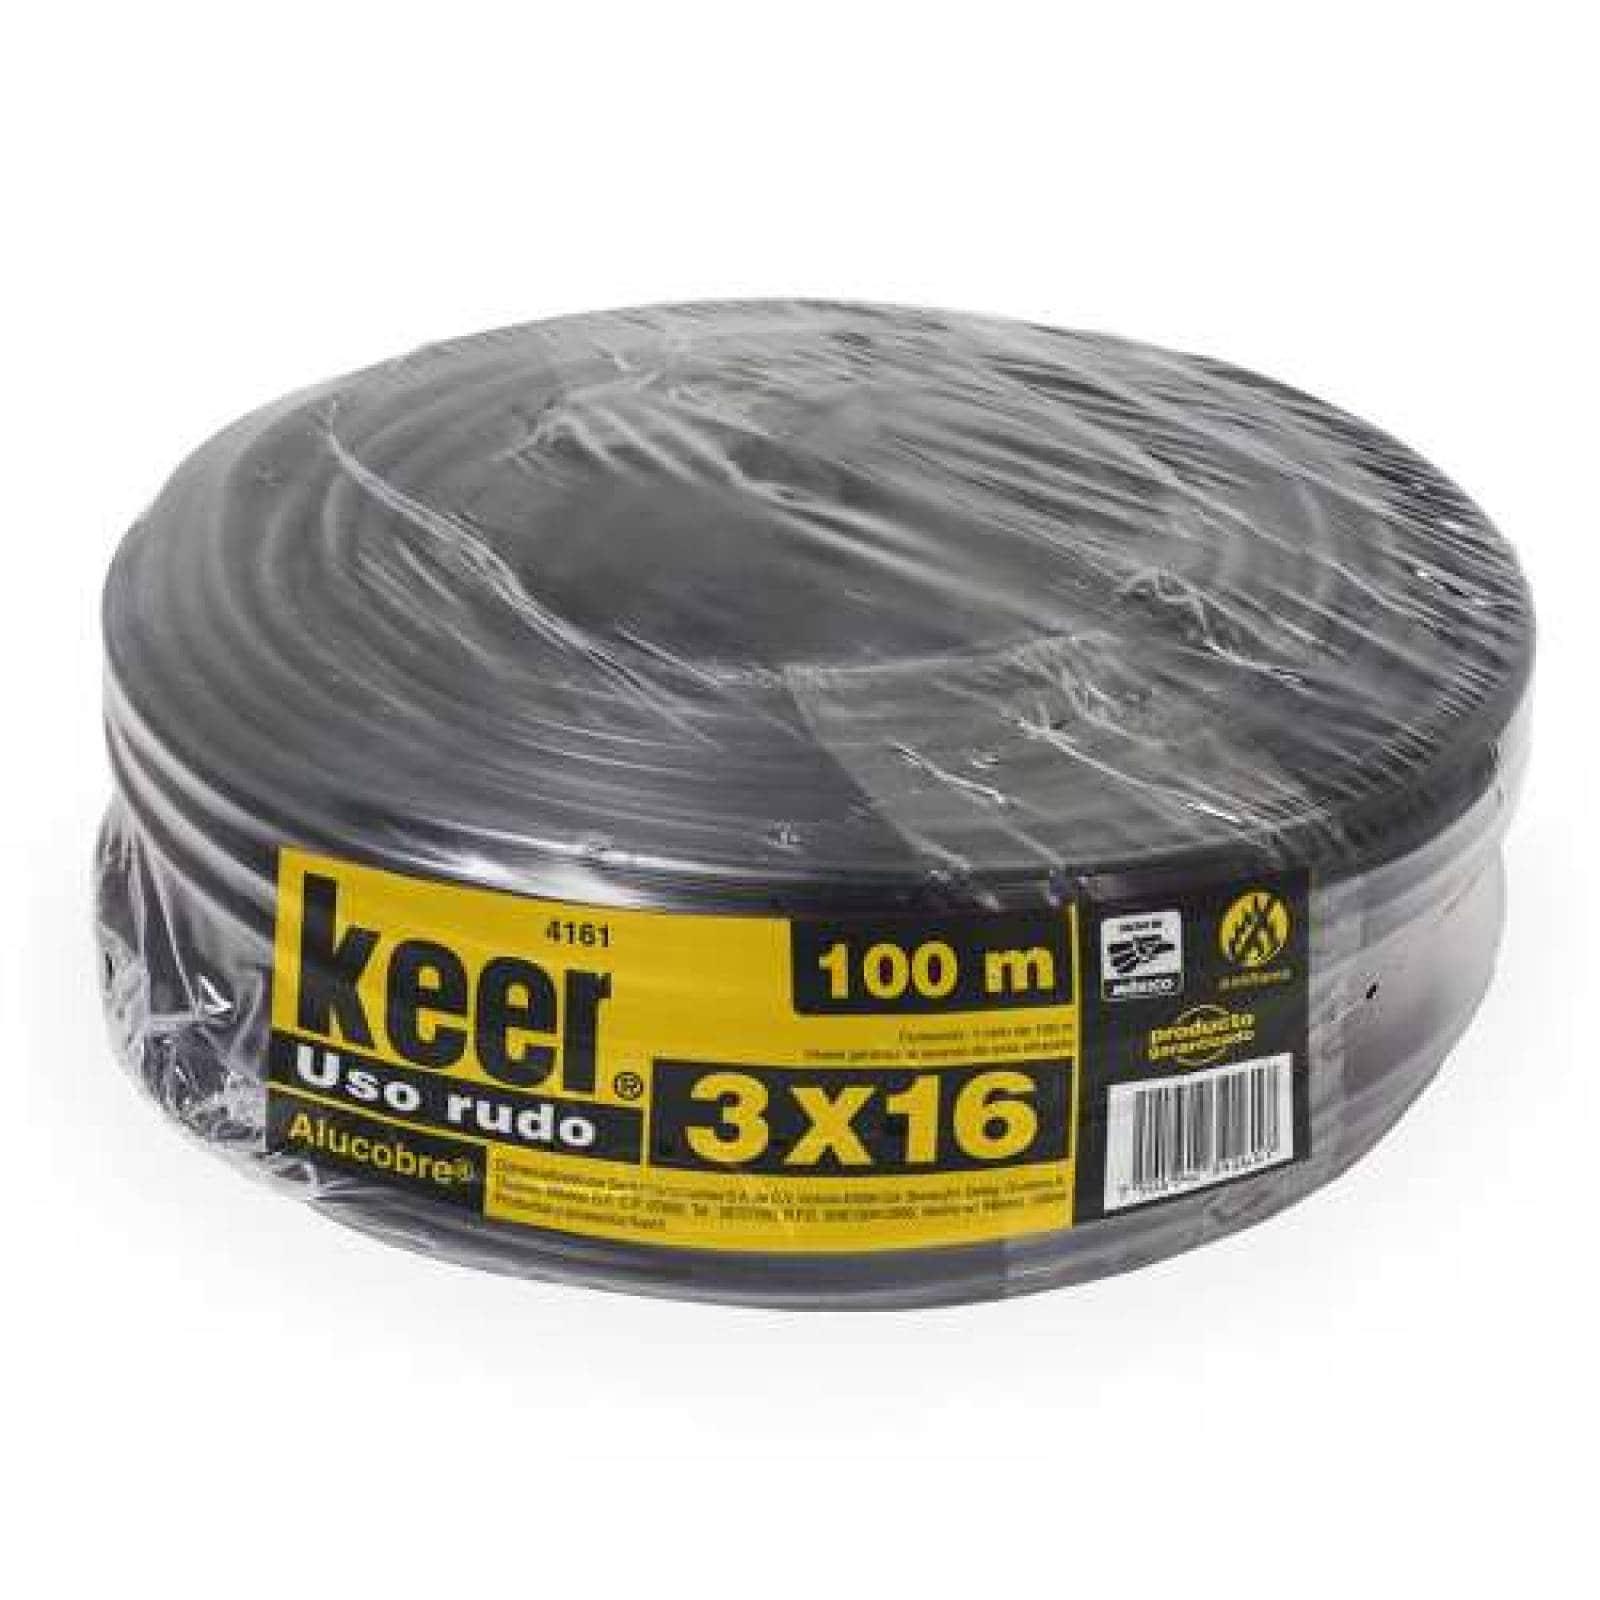 Cable de uso rudo 3x16 rollo100 mts Negro Sanelec